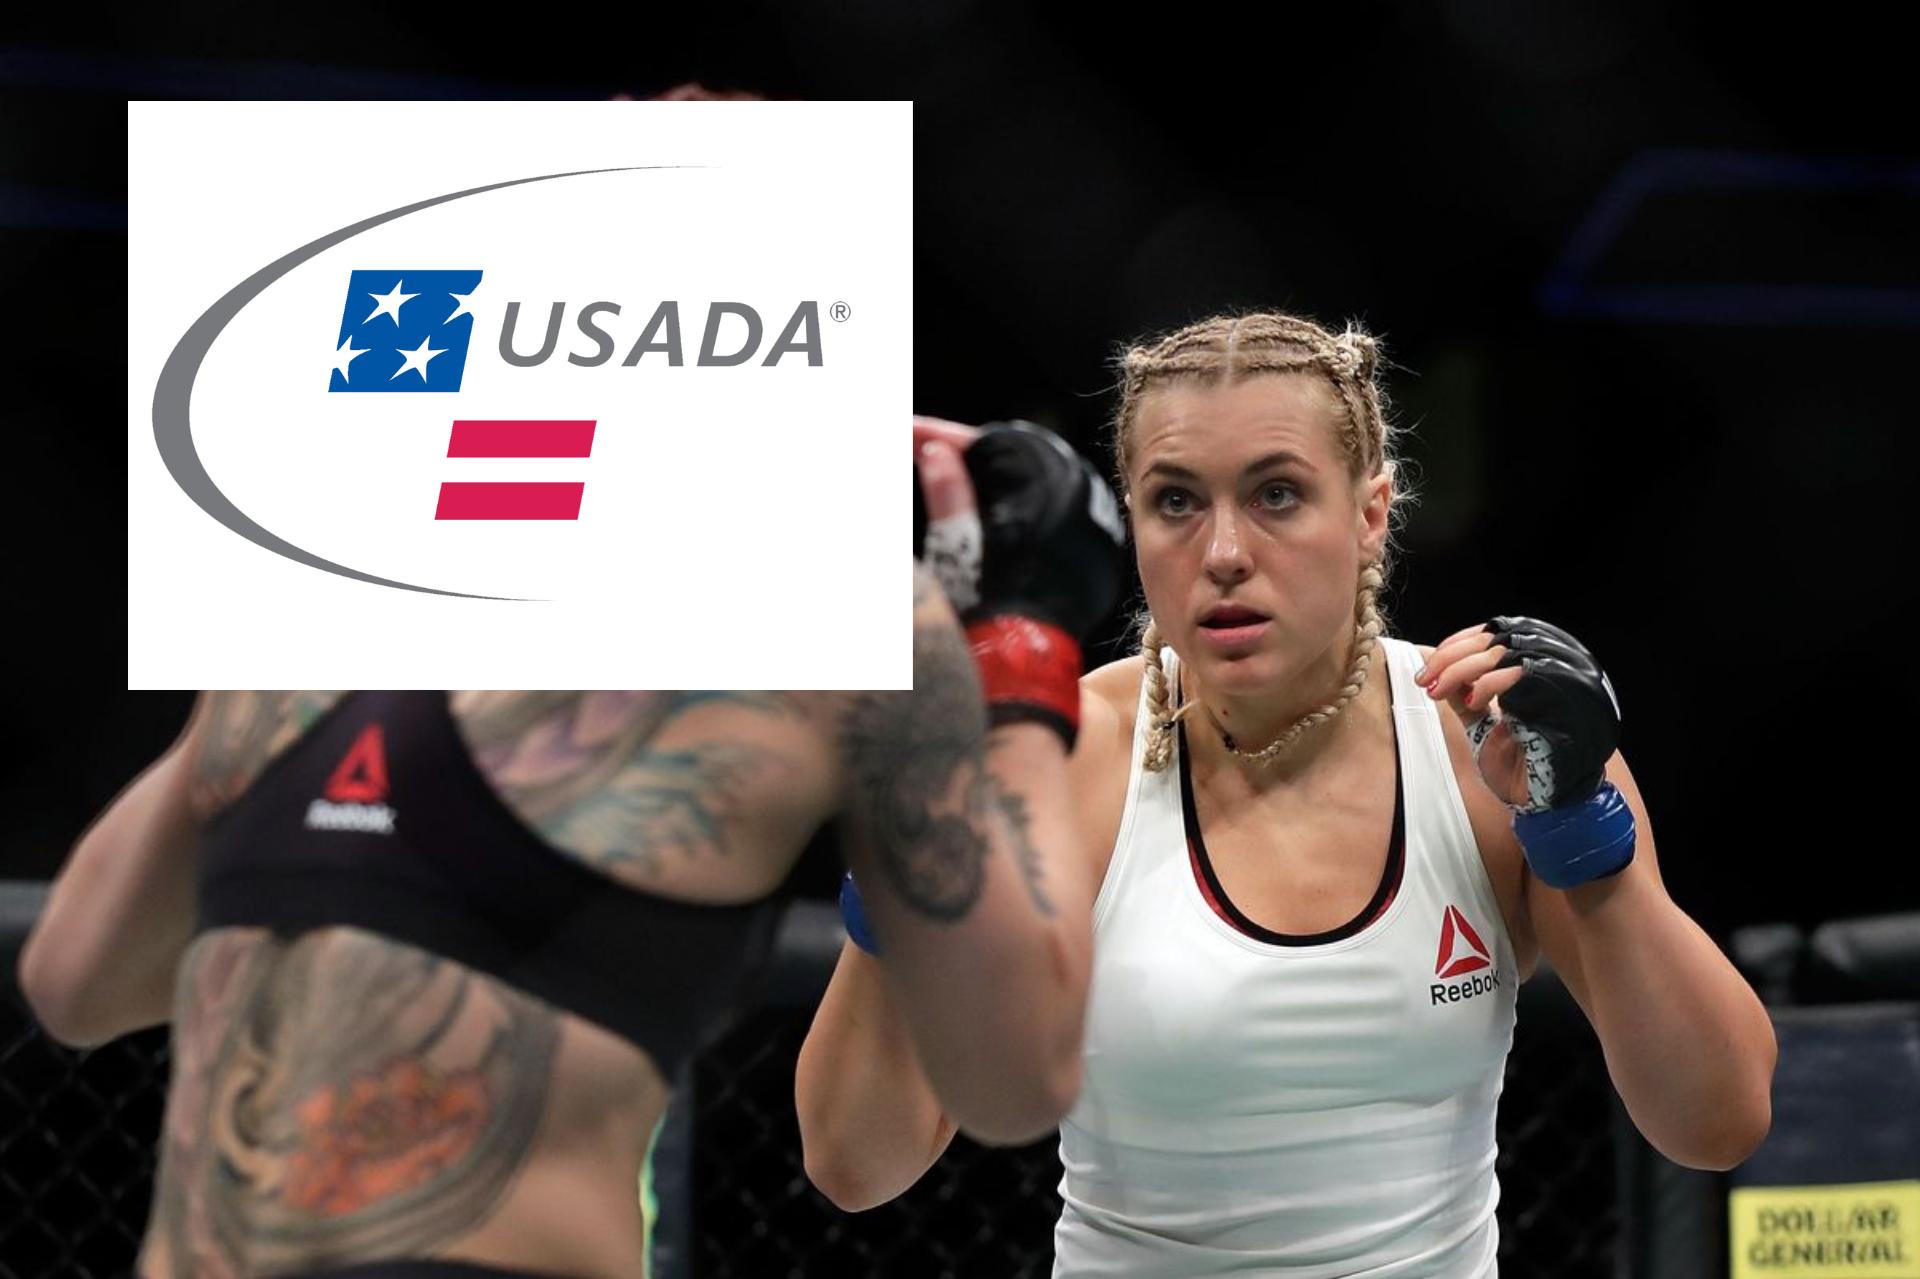 Yana Kunitskaya raises doubts about UFC fighters outside the US being tested regularly by USADA - Yana Kunitskaya